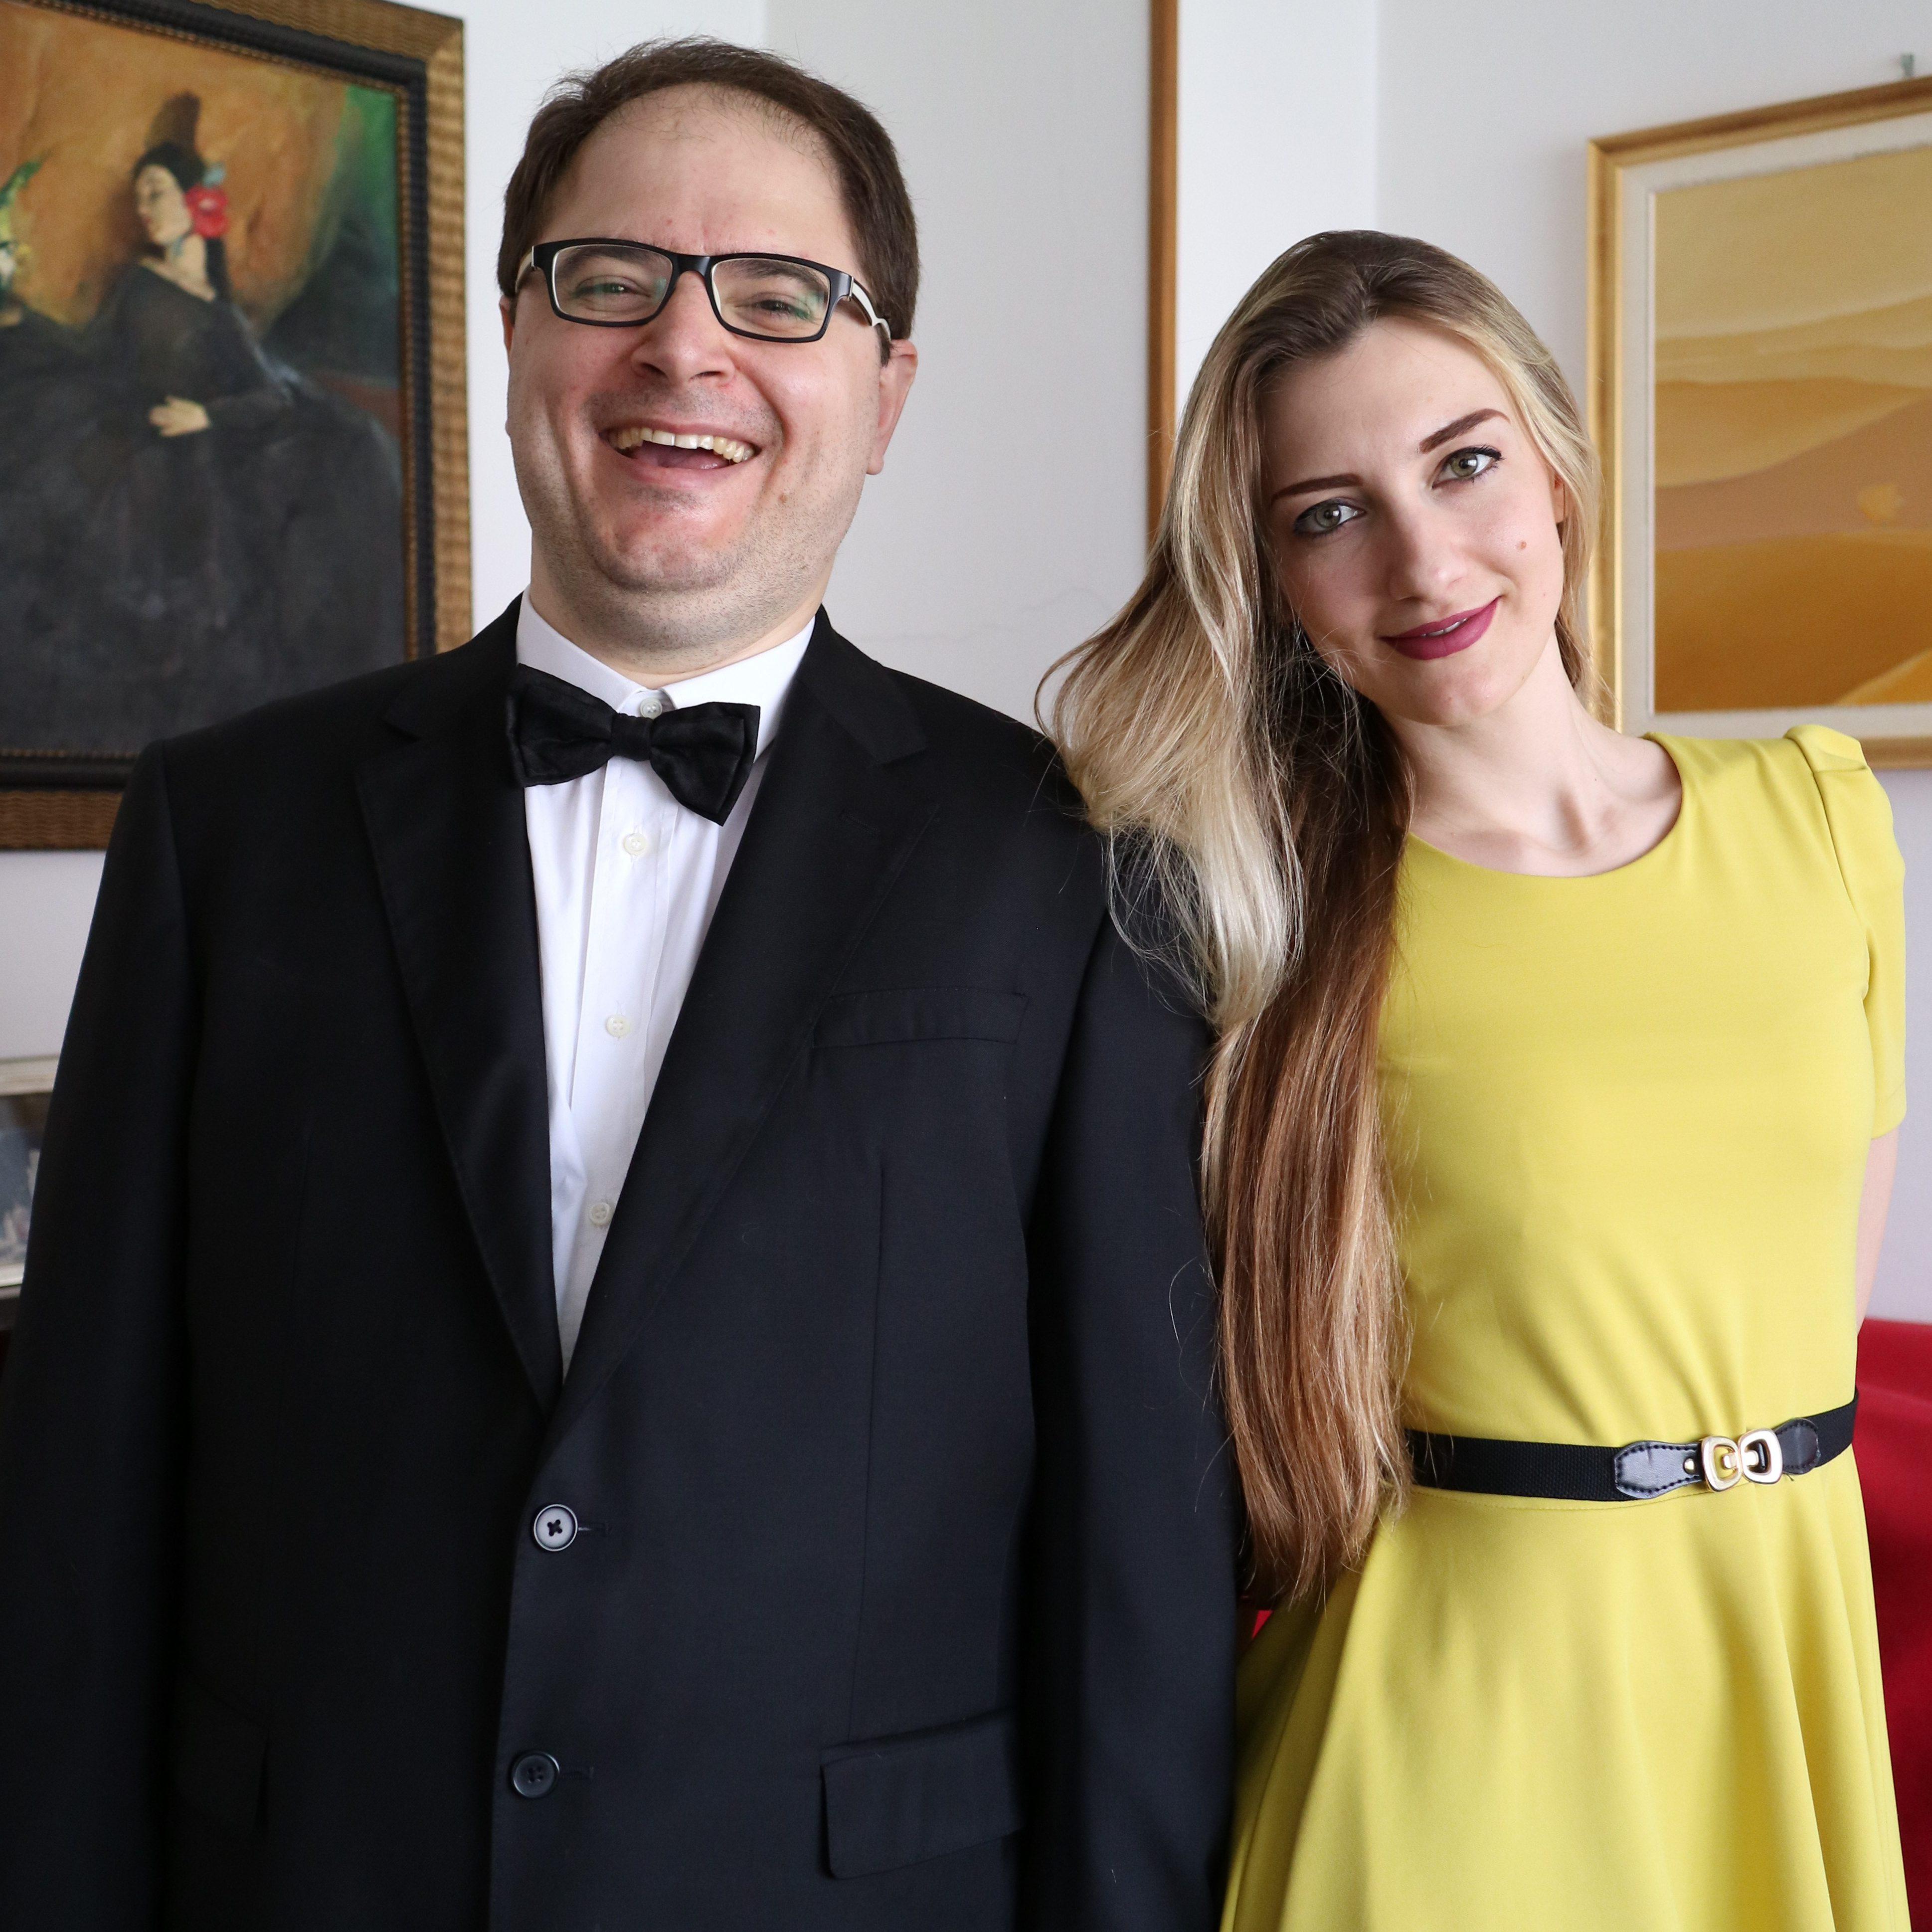 Damiano e Margherita Tercon